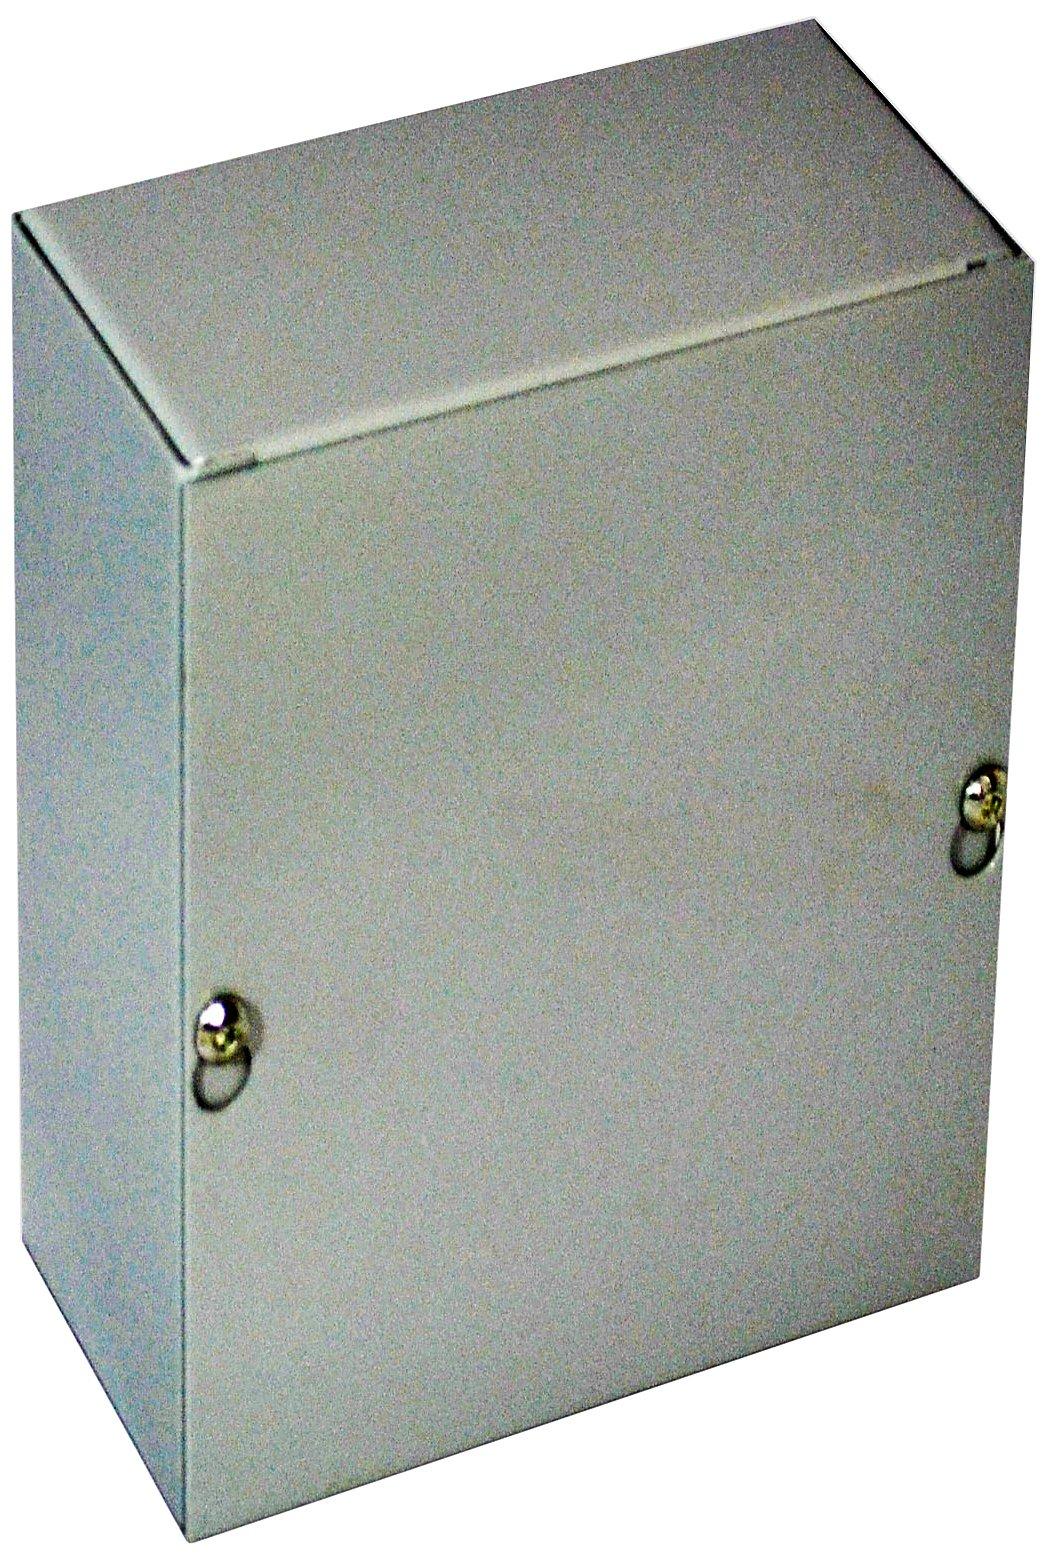 BUD Industries JB-3944 Steel NEMA 1 Sheet Metal Junction Box with Lift-off Screw Cover, 4'' Width x 6'' Height x 3-1/2'' Depth, Gray Finish